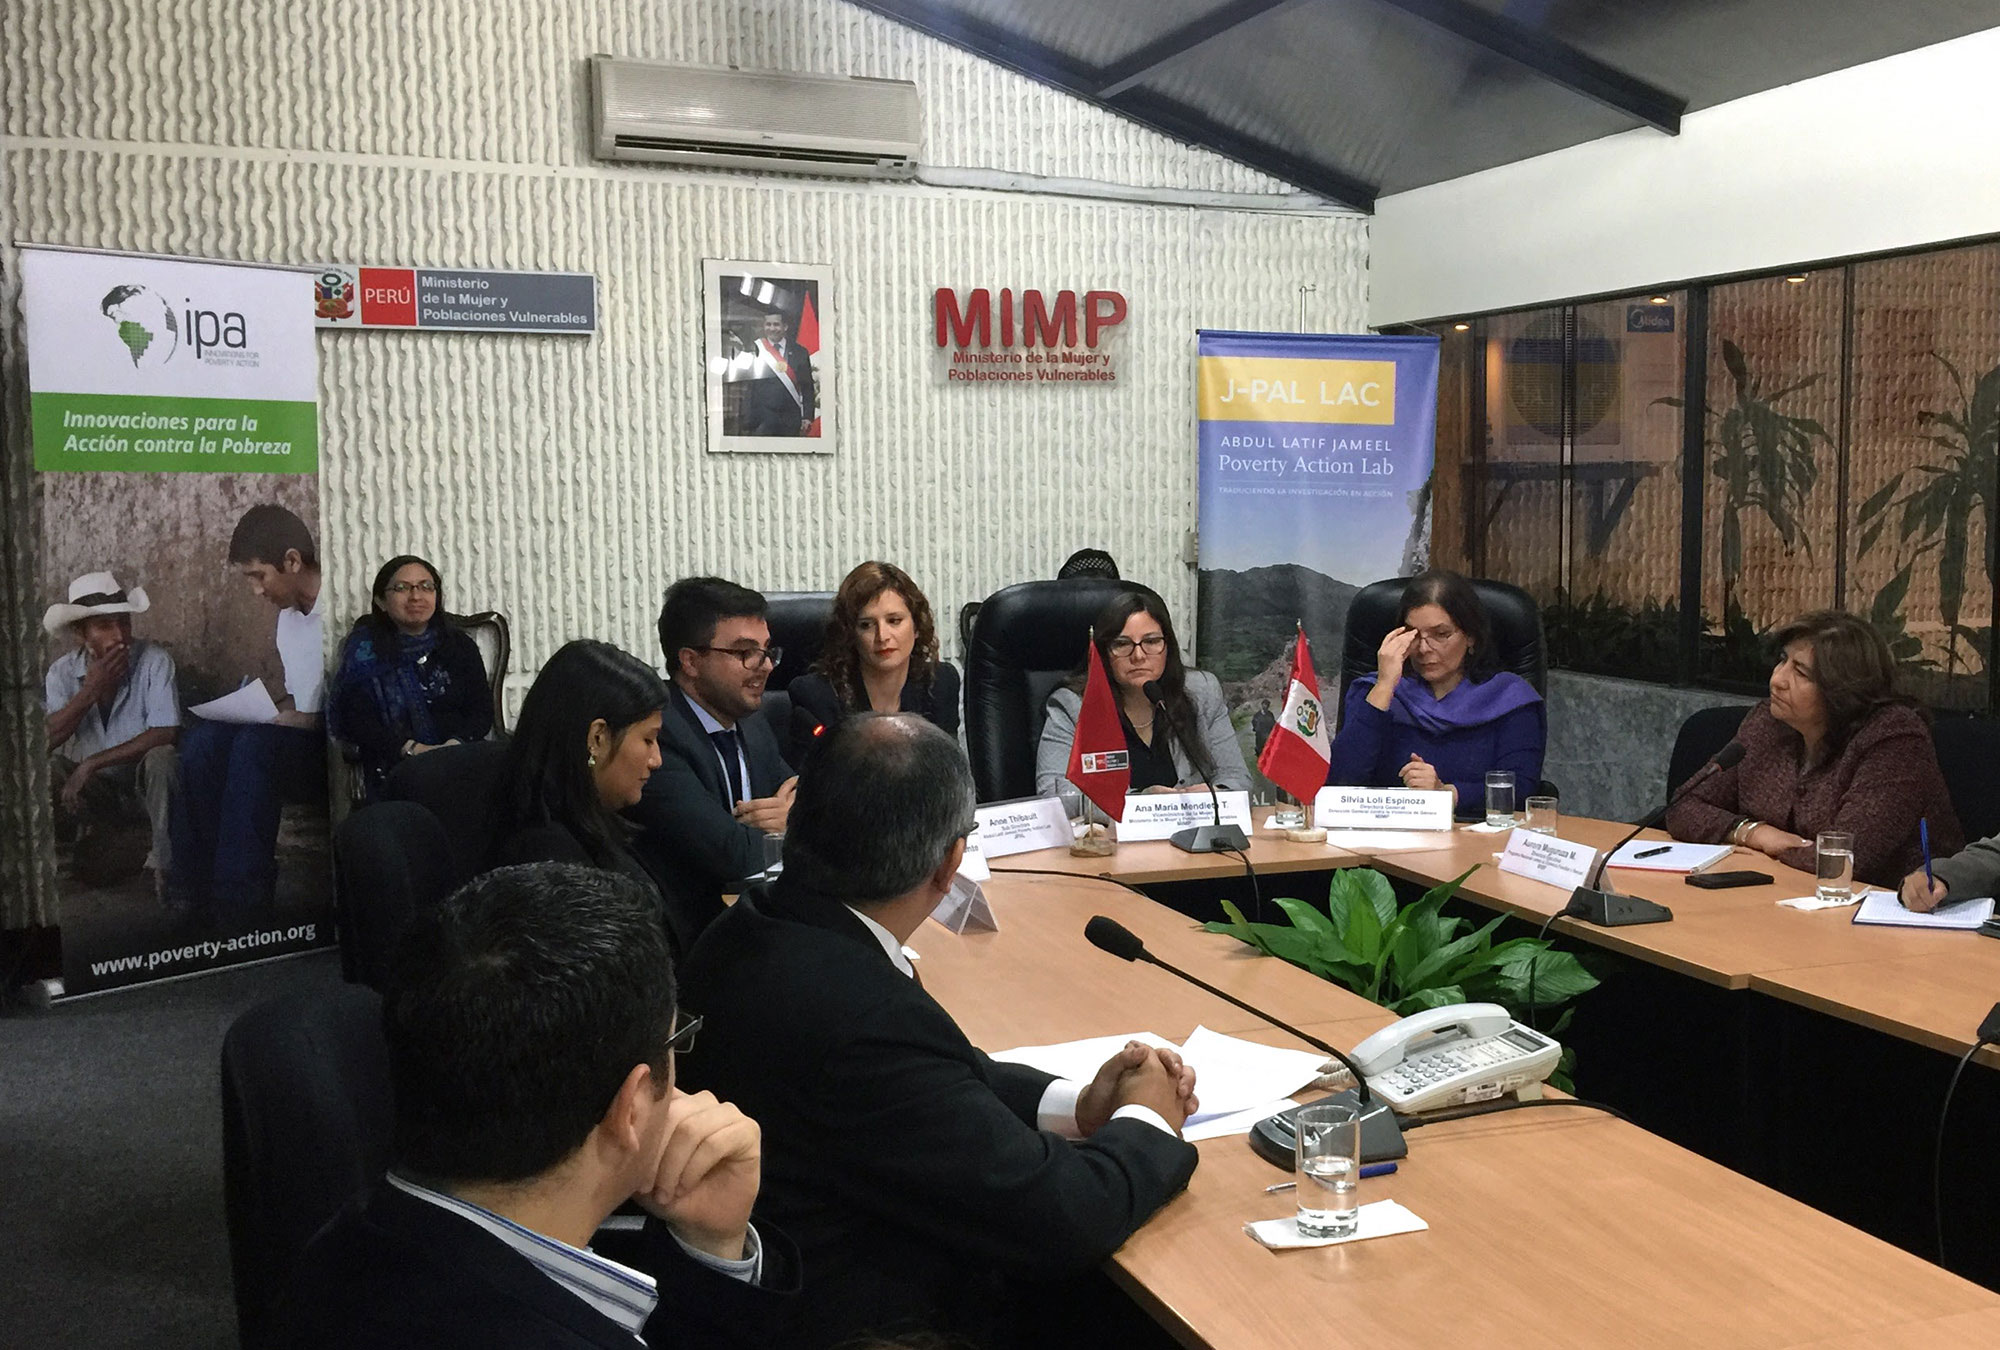 Meeting between J-PAL LAC and MIMP